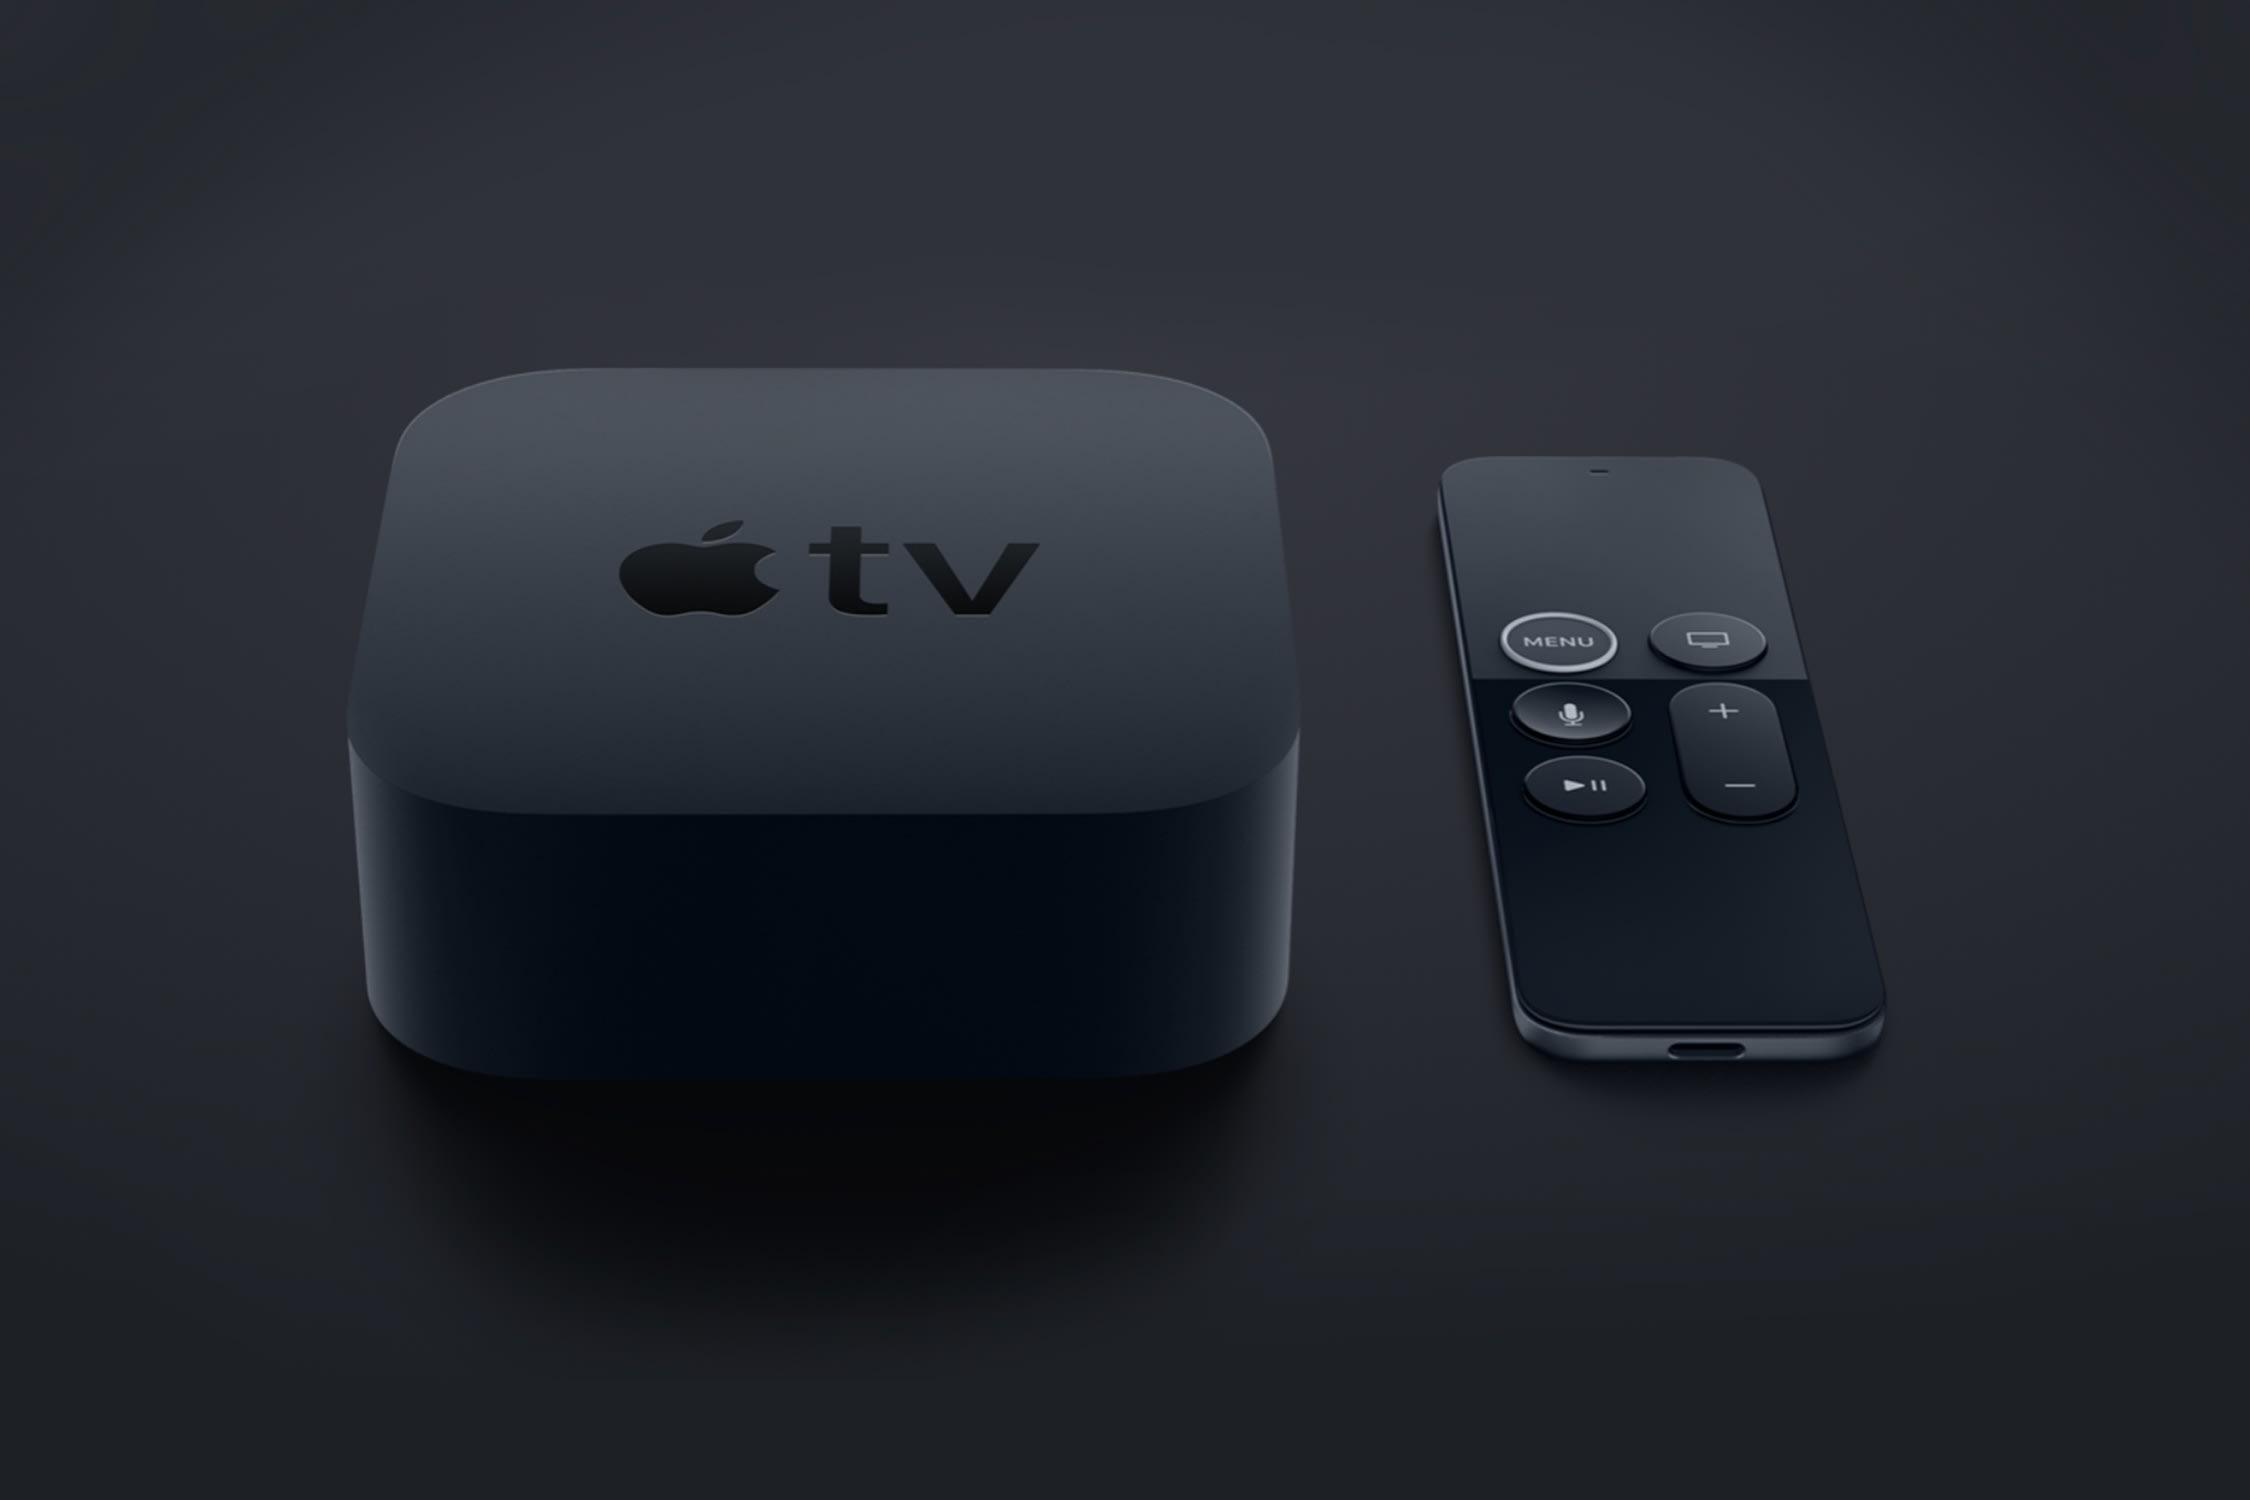 allapplenews-apple-tv-and-remote